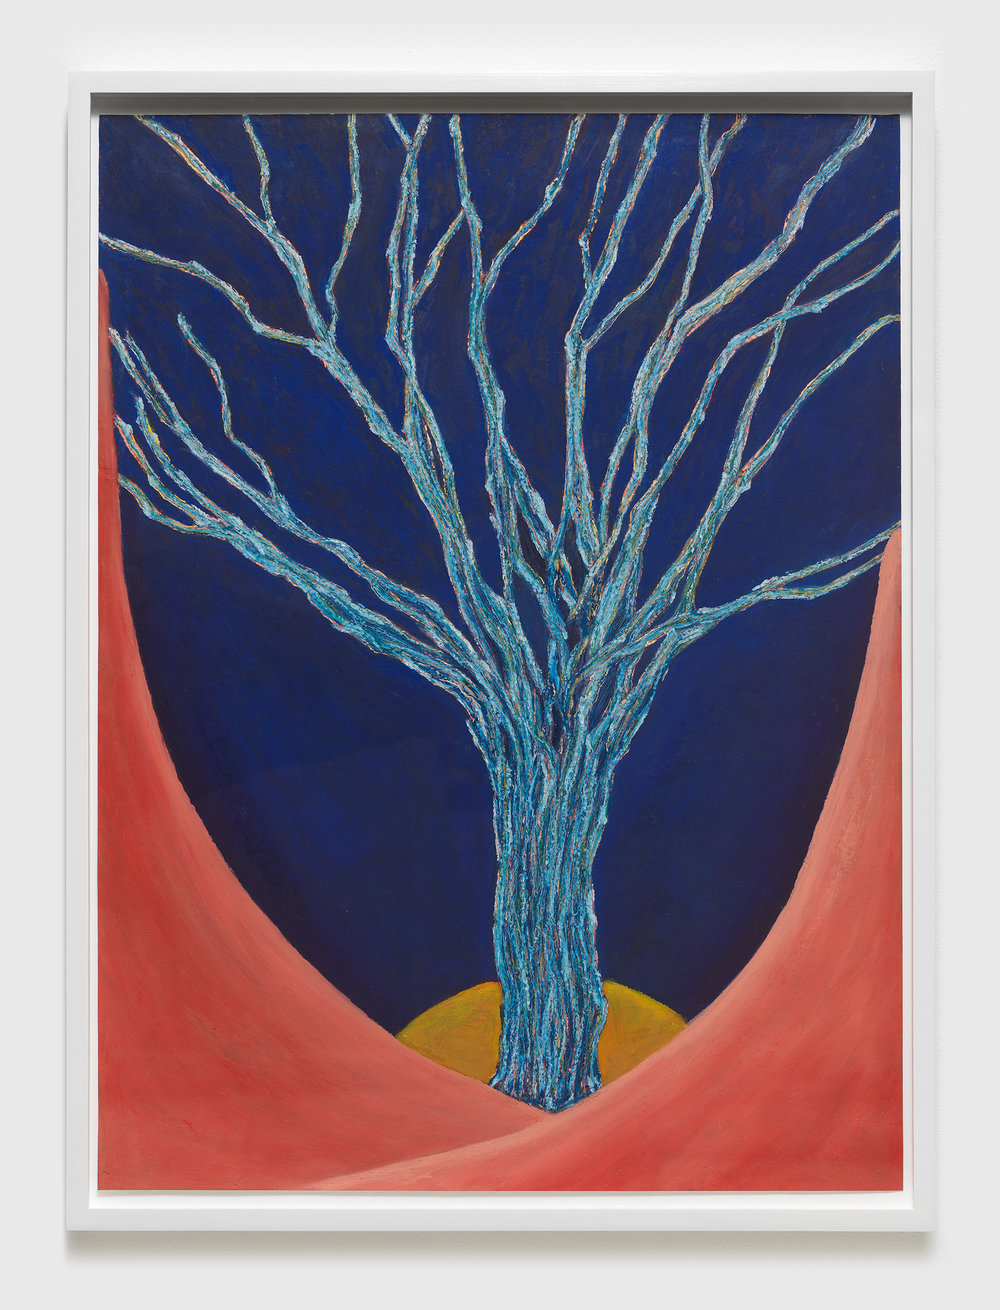 Ping Zheng ,  Sad Season of Sensation , 2017, Oil stick on paper, Artwork dimensions: 24 x 14 1/2 inches